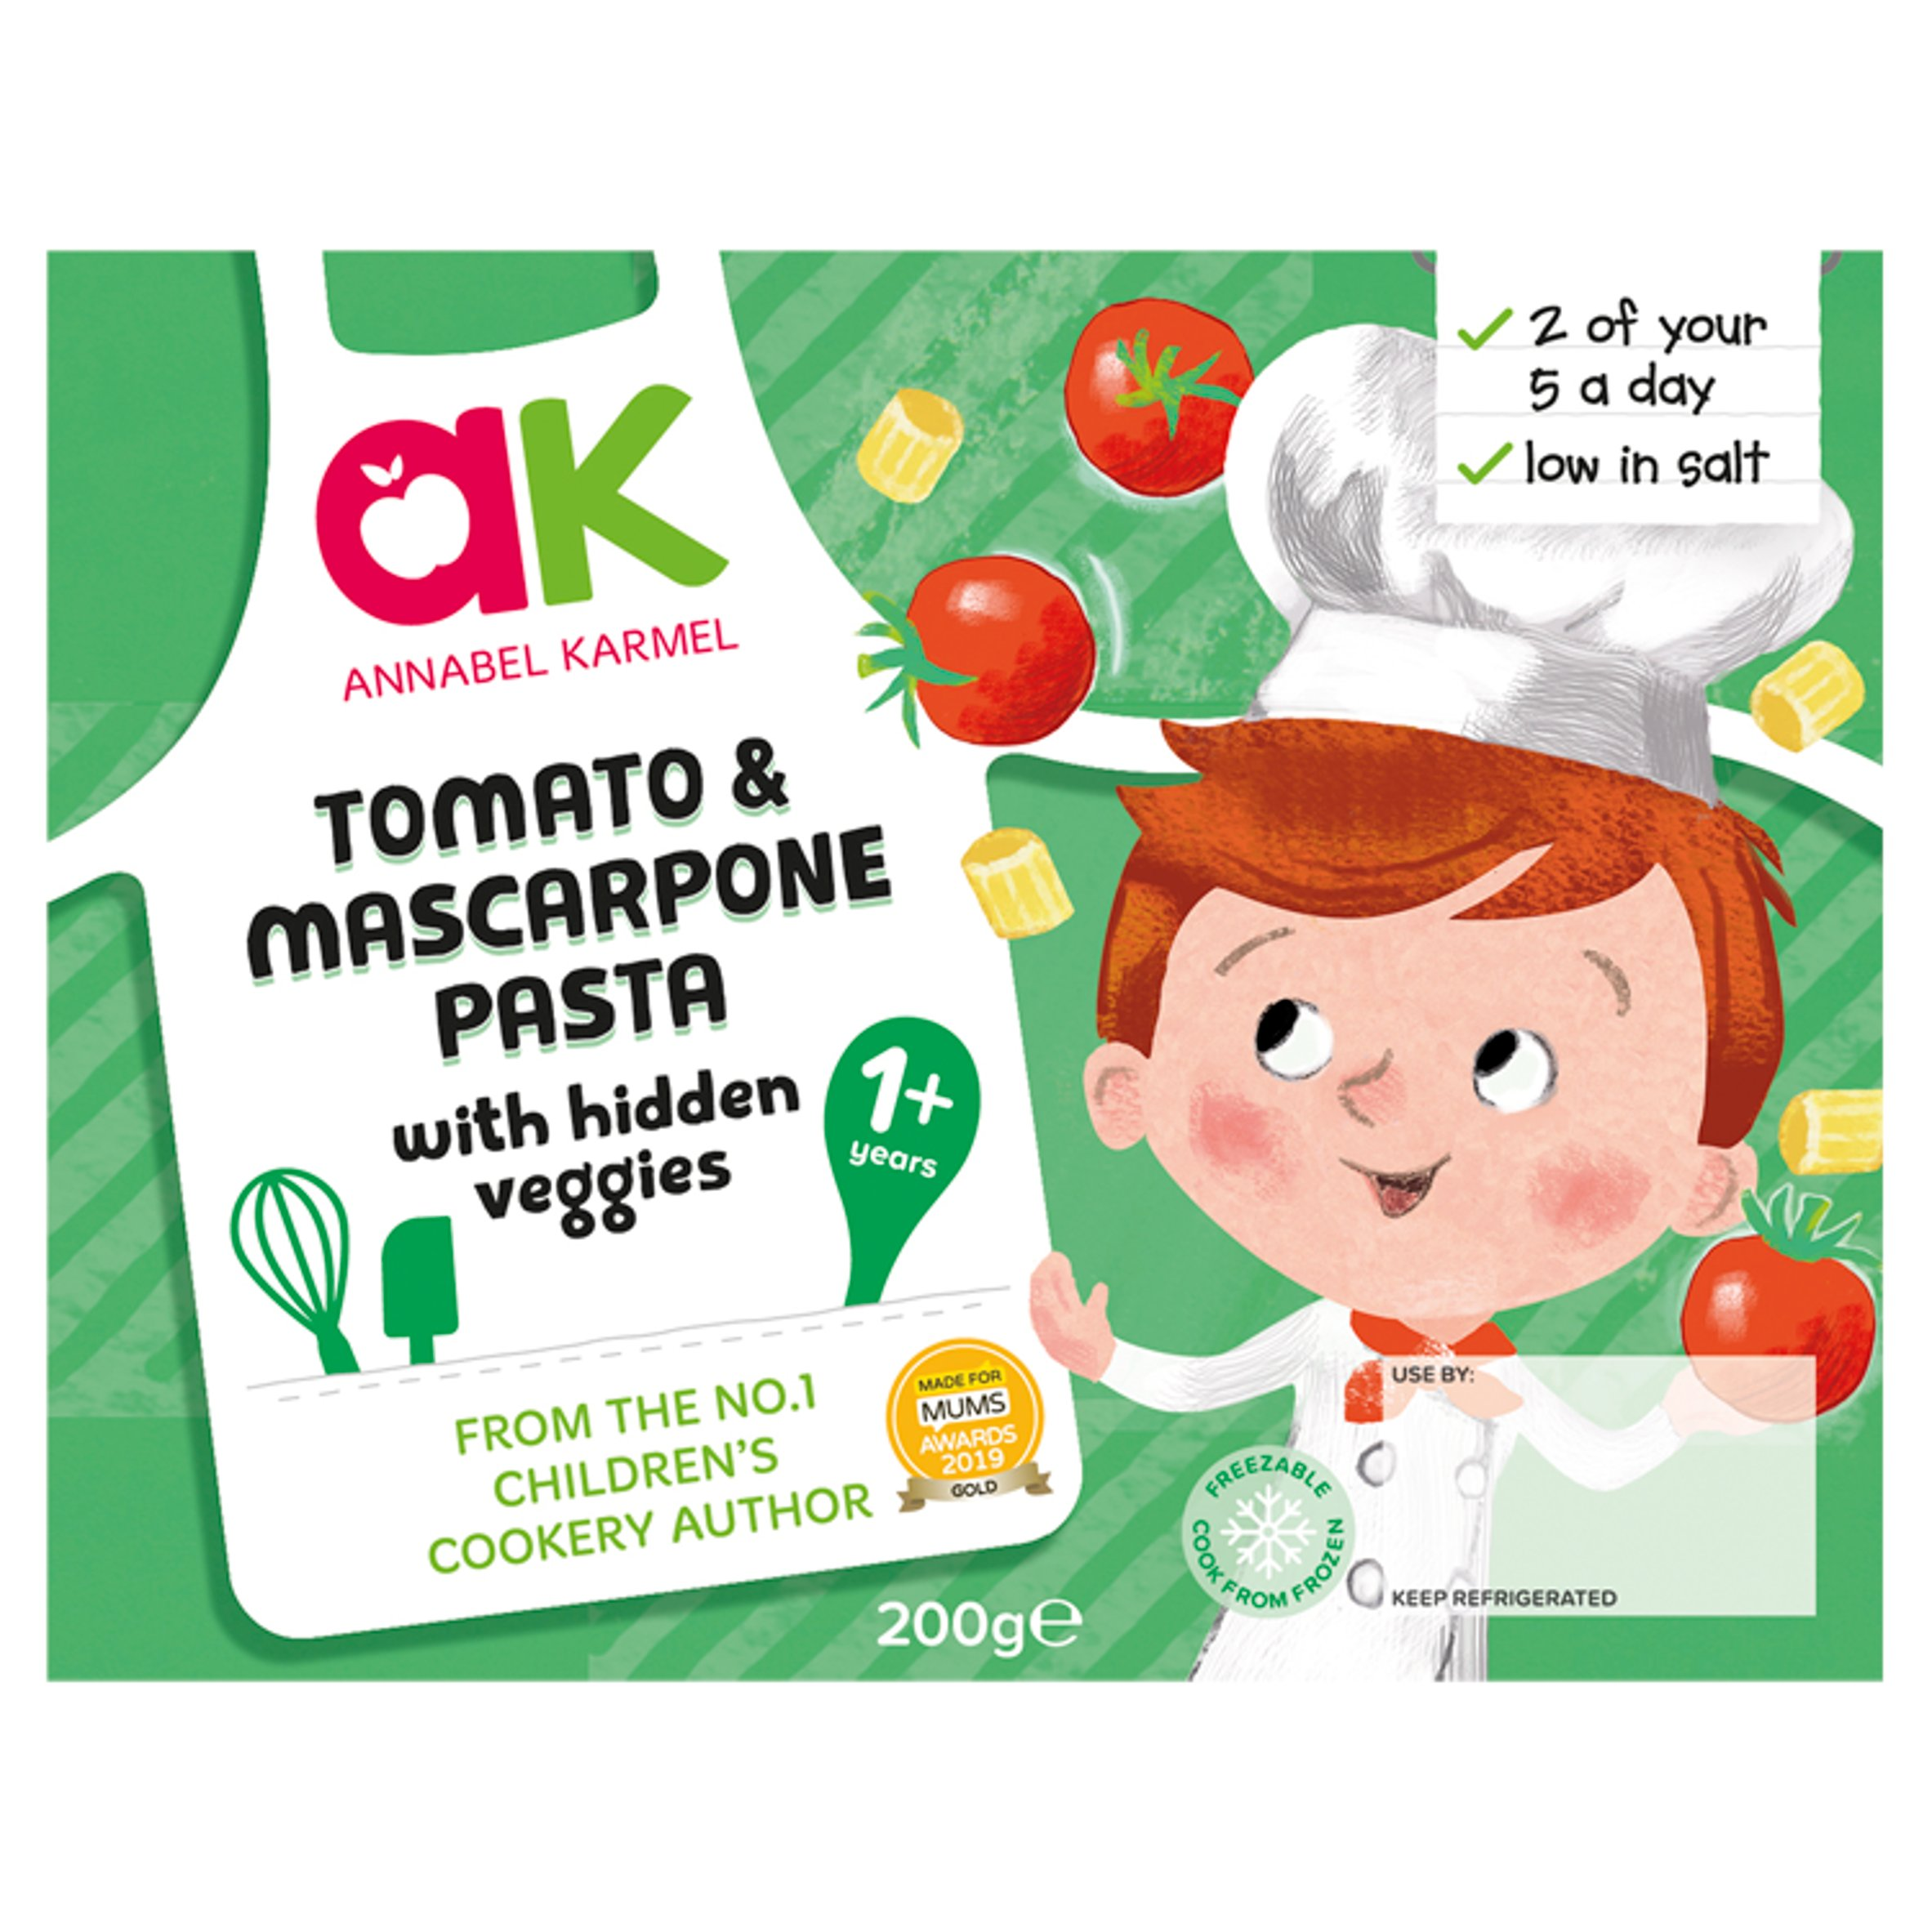 Annabel Karmel Tomato & Mascarpone With Vegetables 200G